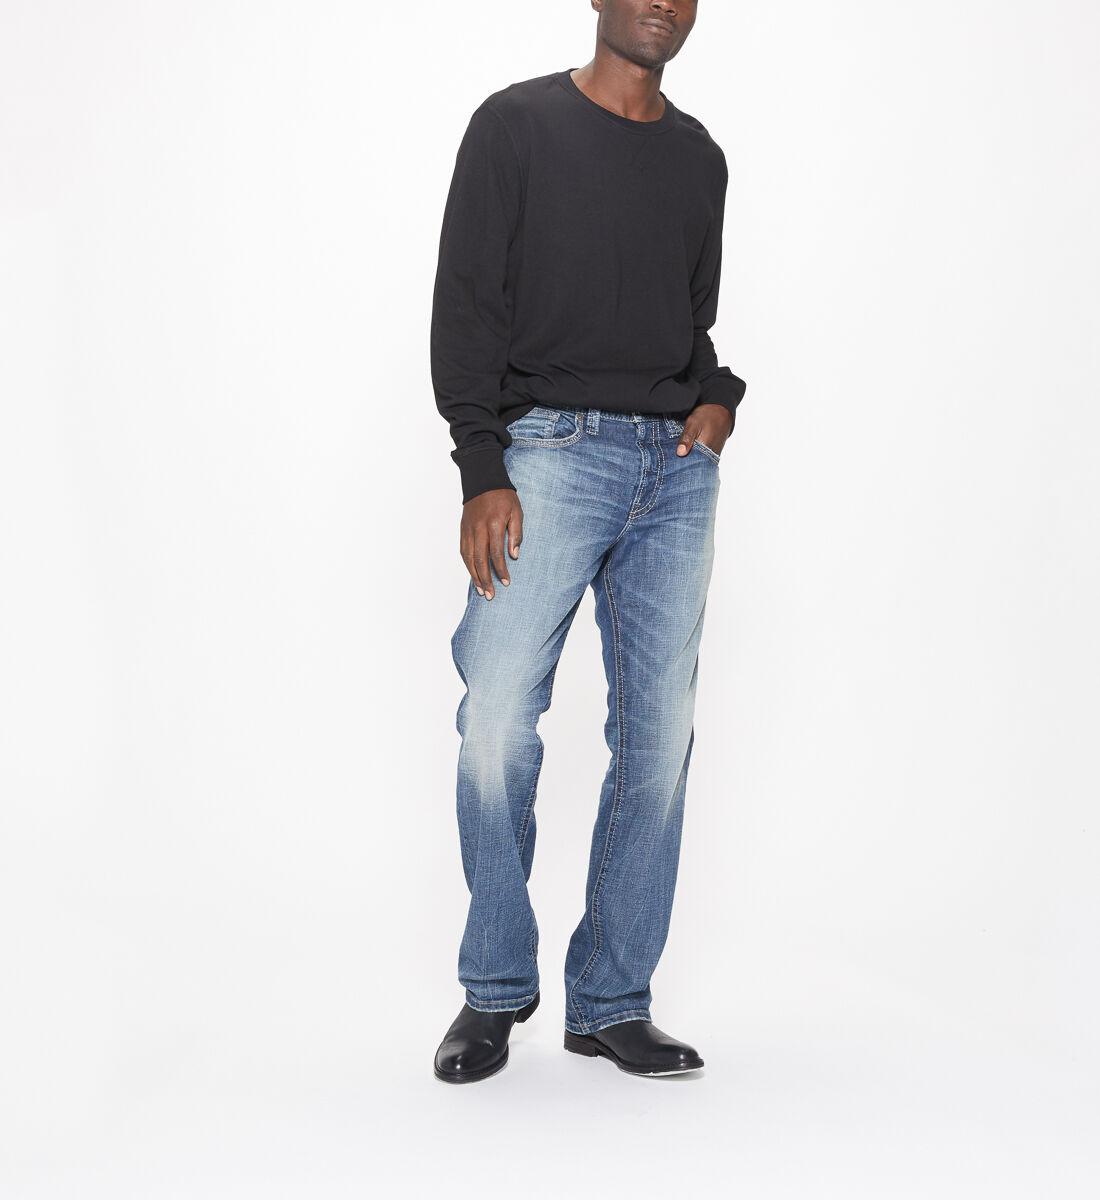 Gordie Loose Fit Straight Leg Jeans Alt Image 1